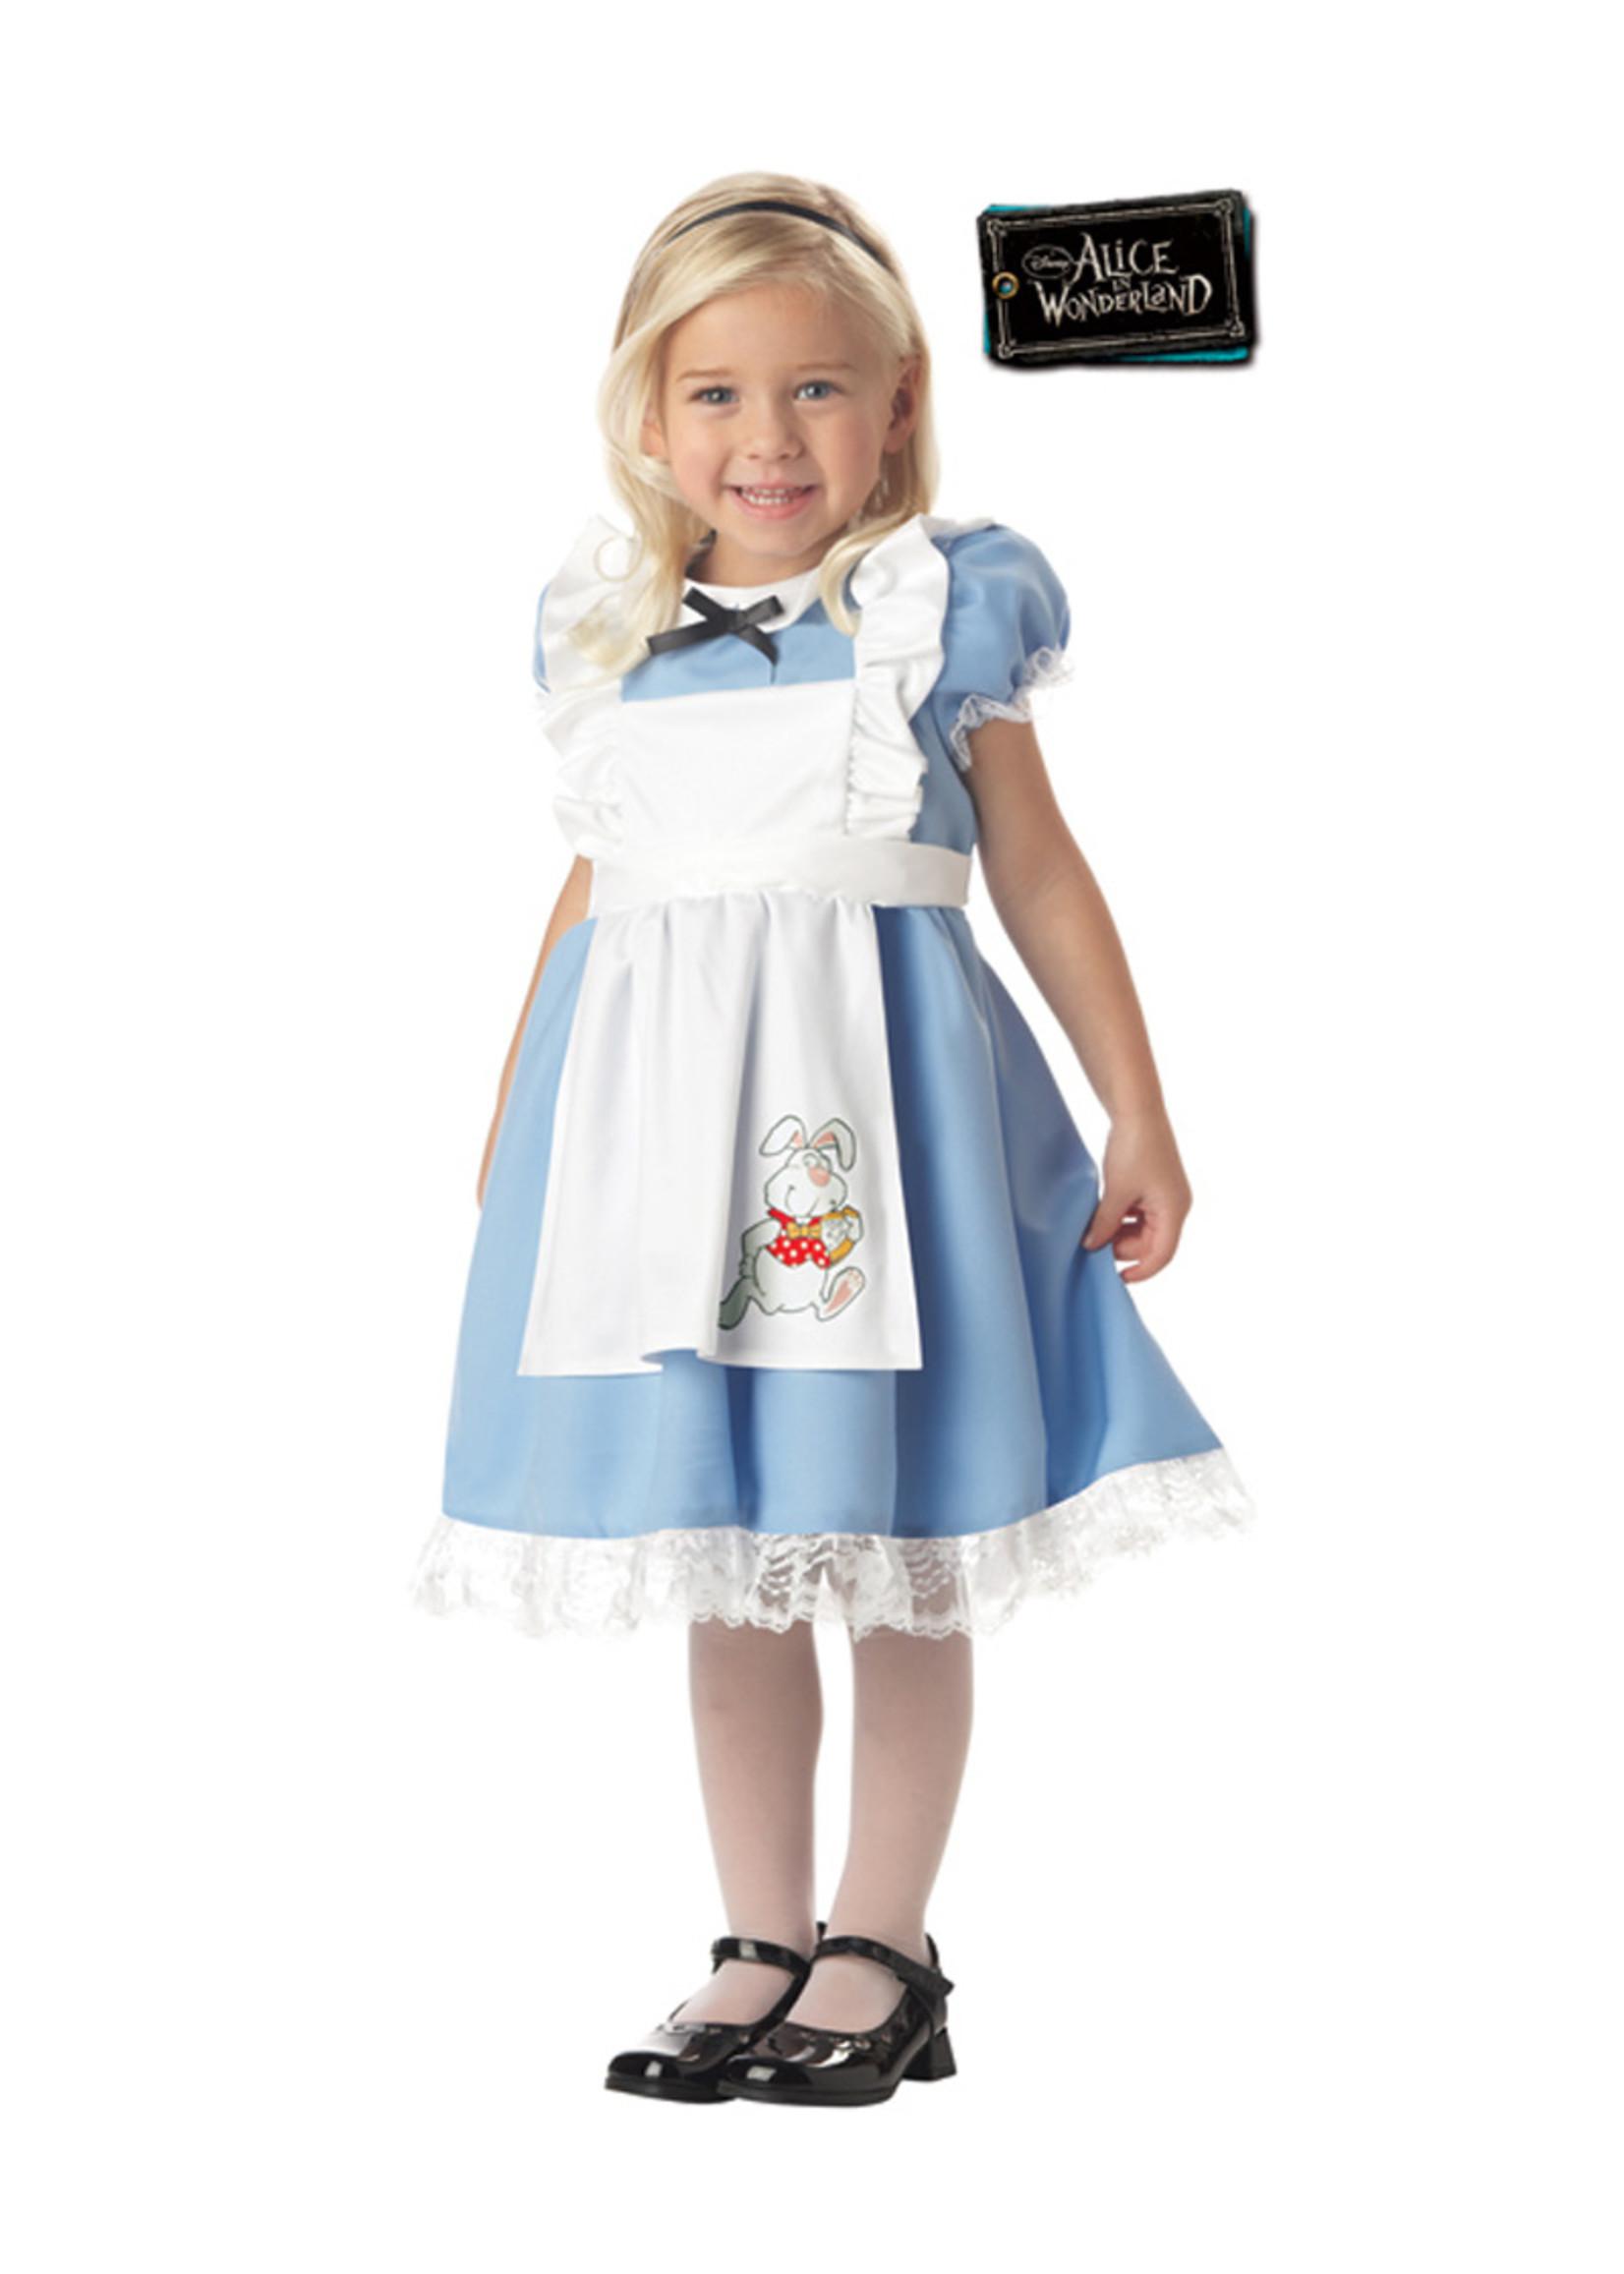 Alice in Wonderland Costume - Toddler